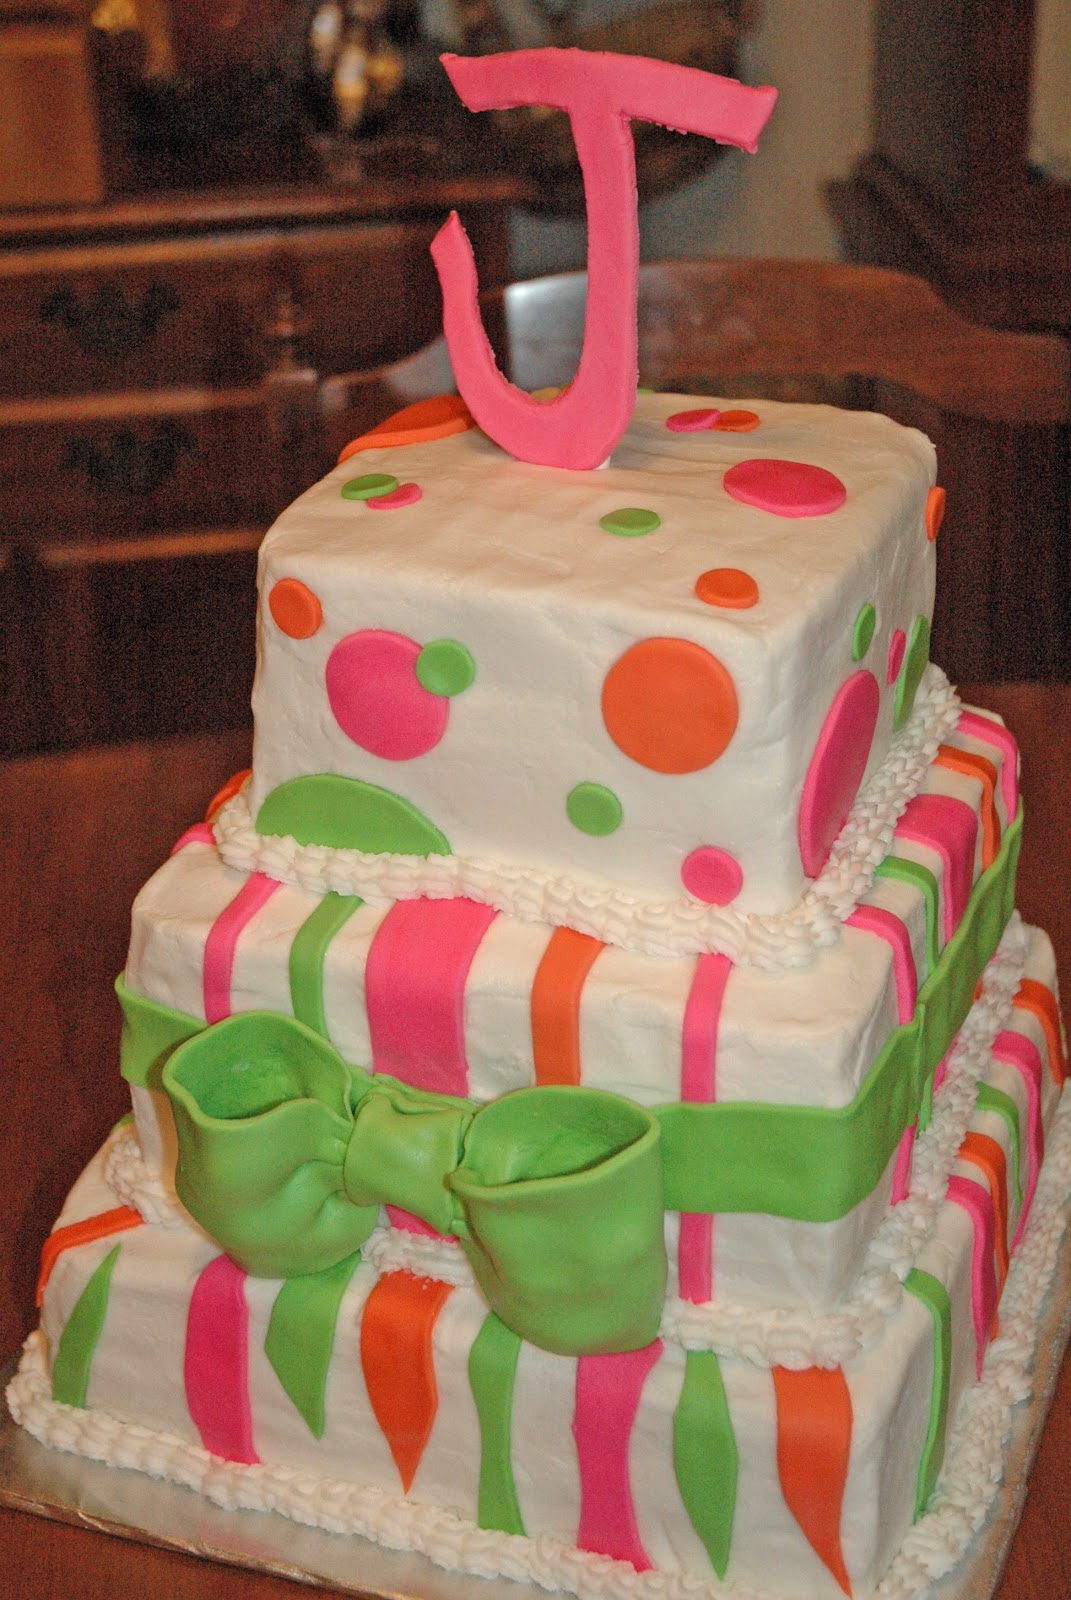 Cashs Cakes Lime Green Pink Orange 3 Tiered Birthday Cake